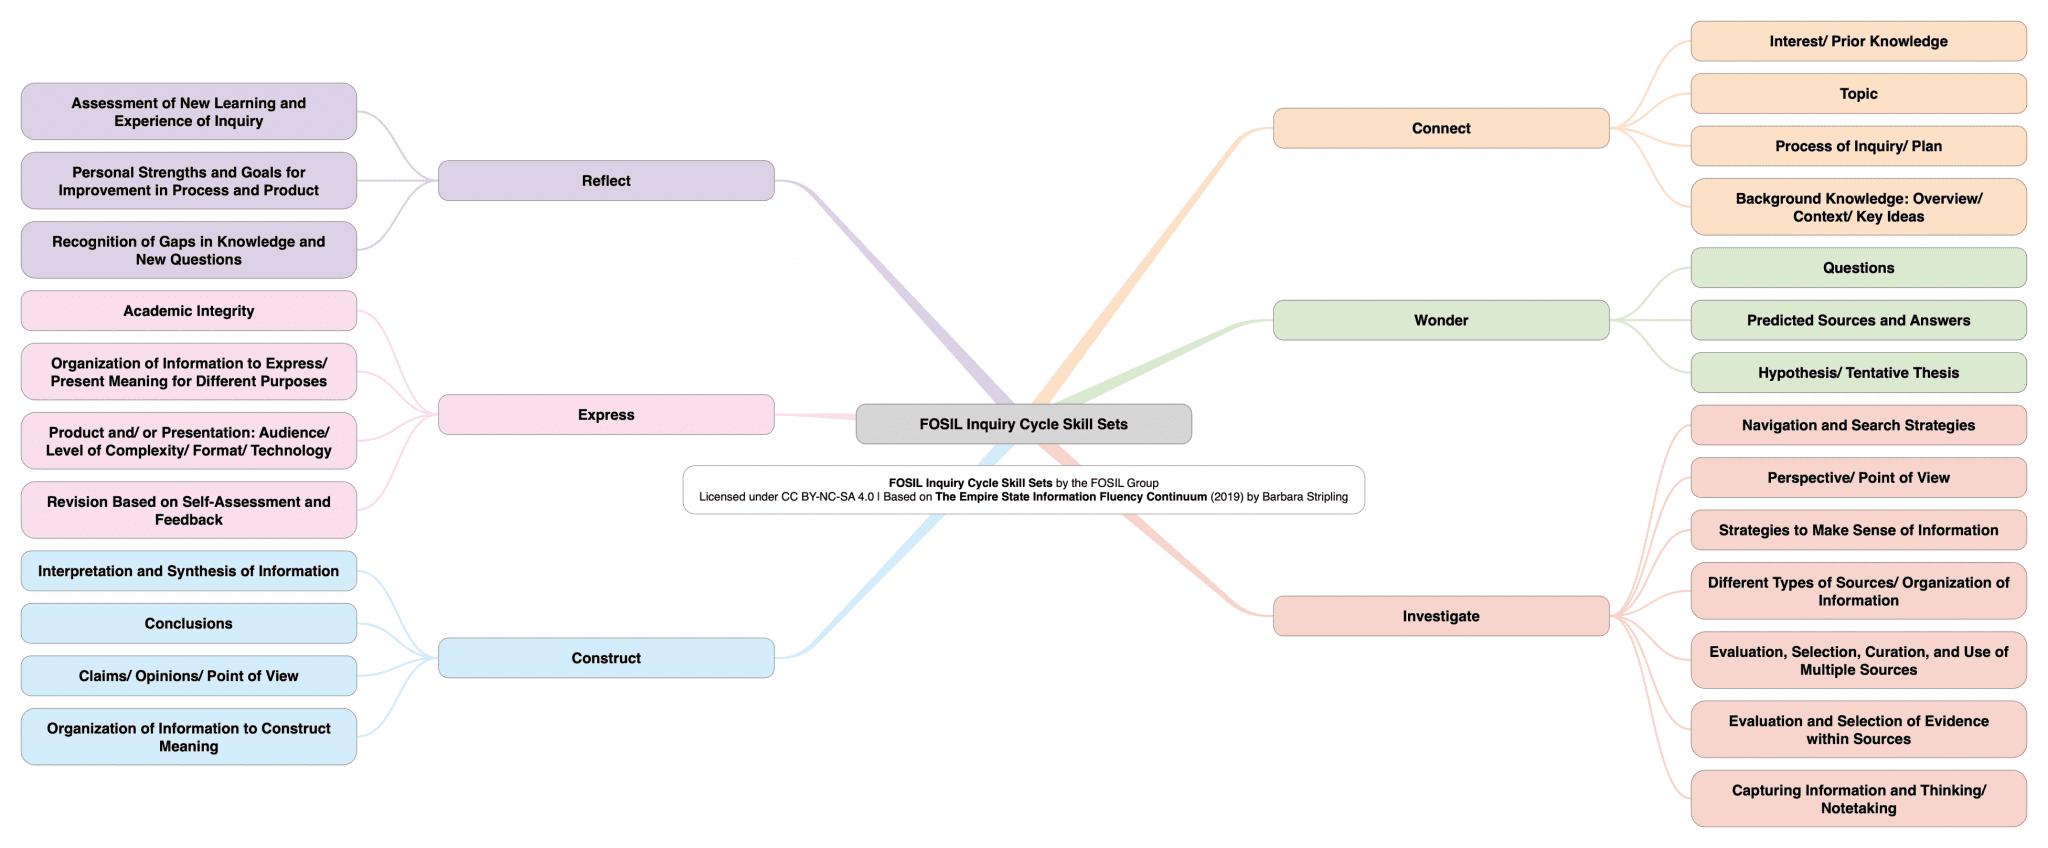 FOSIL Cycle Skill Sets